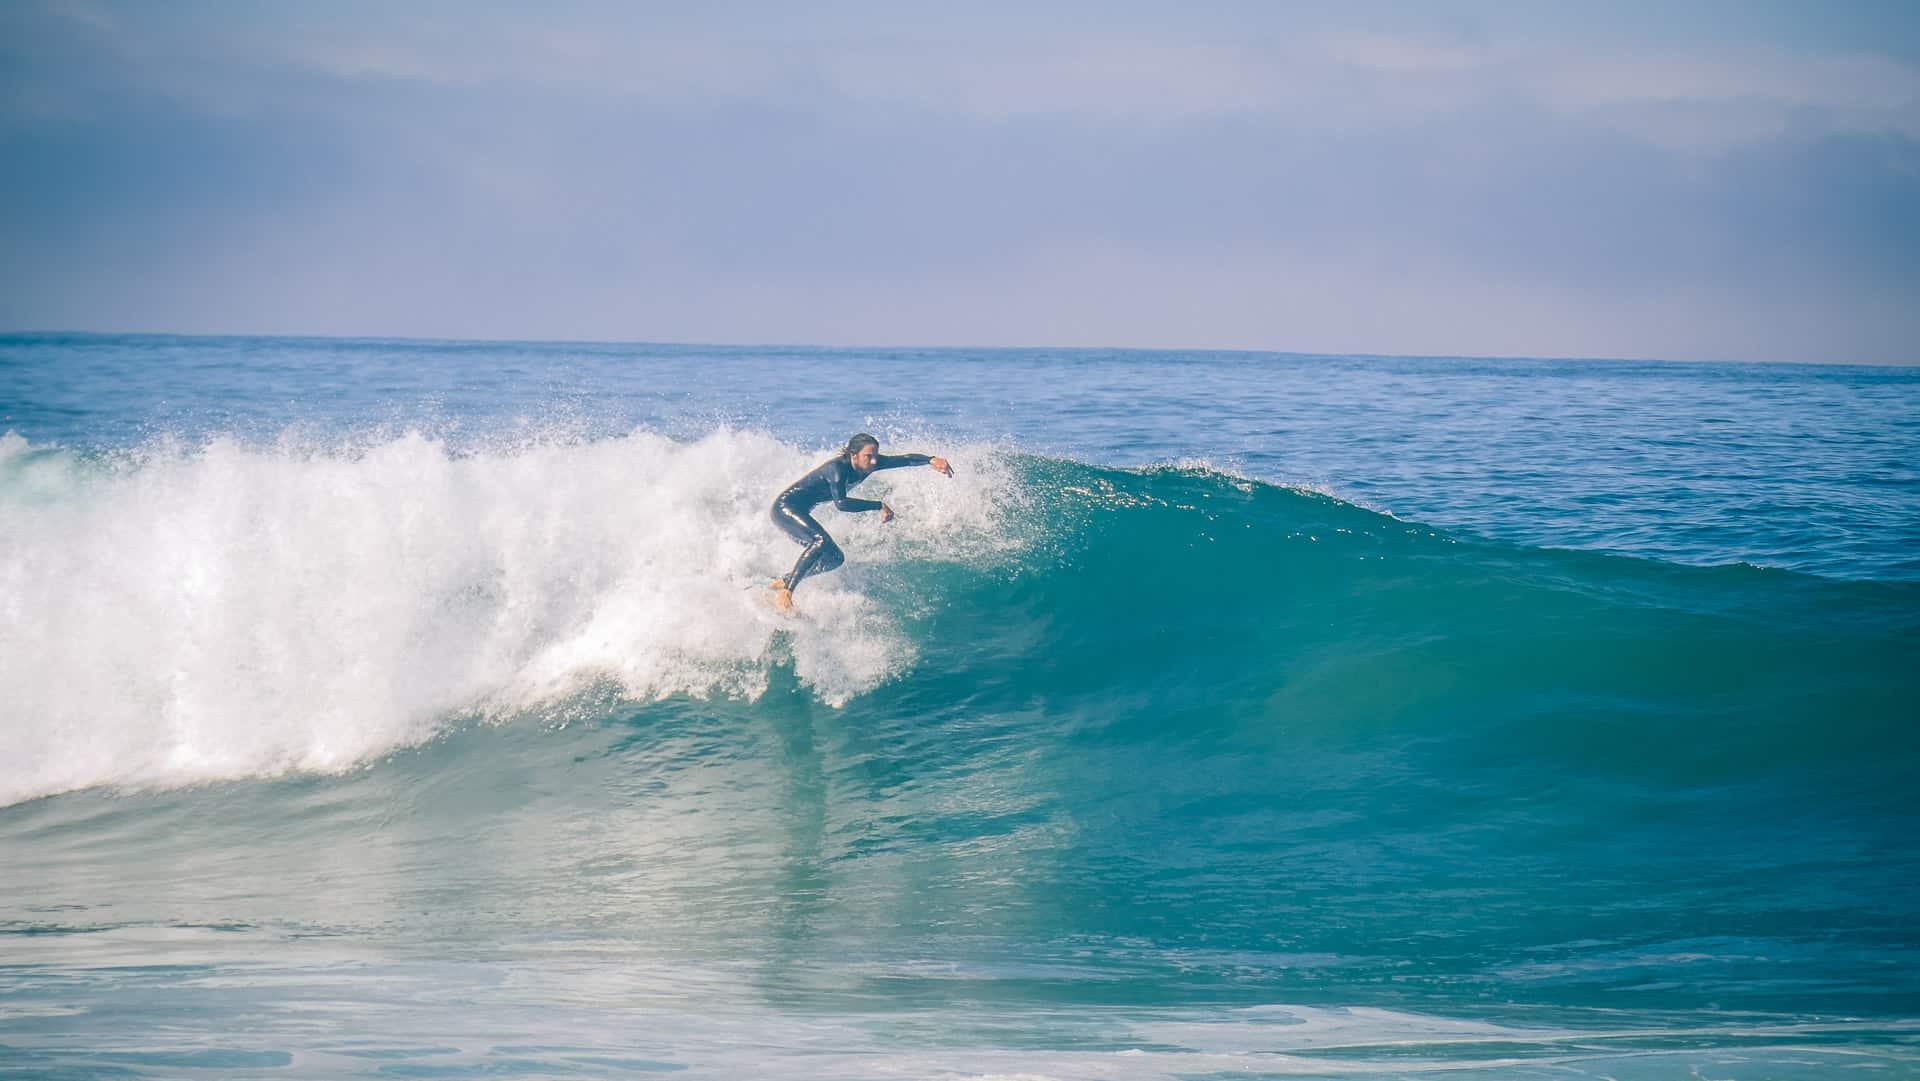 Leeroy Stephenson San Pedrito Beach